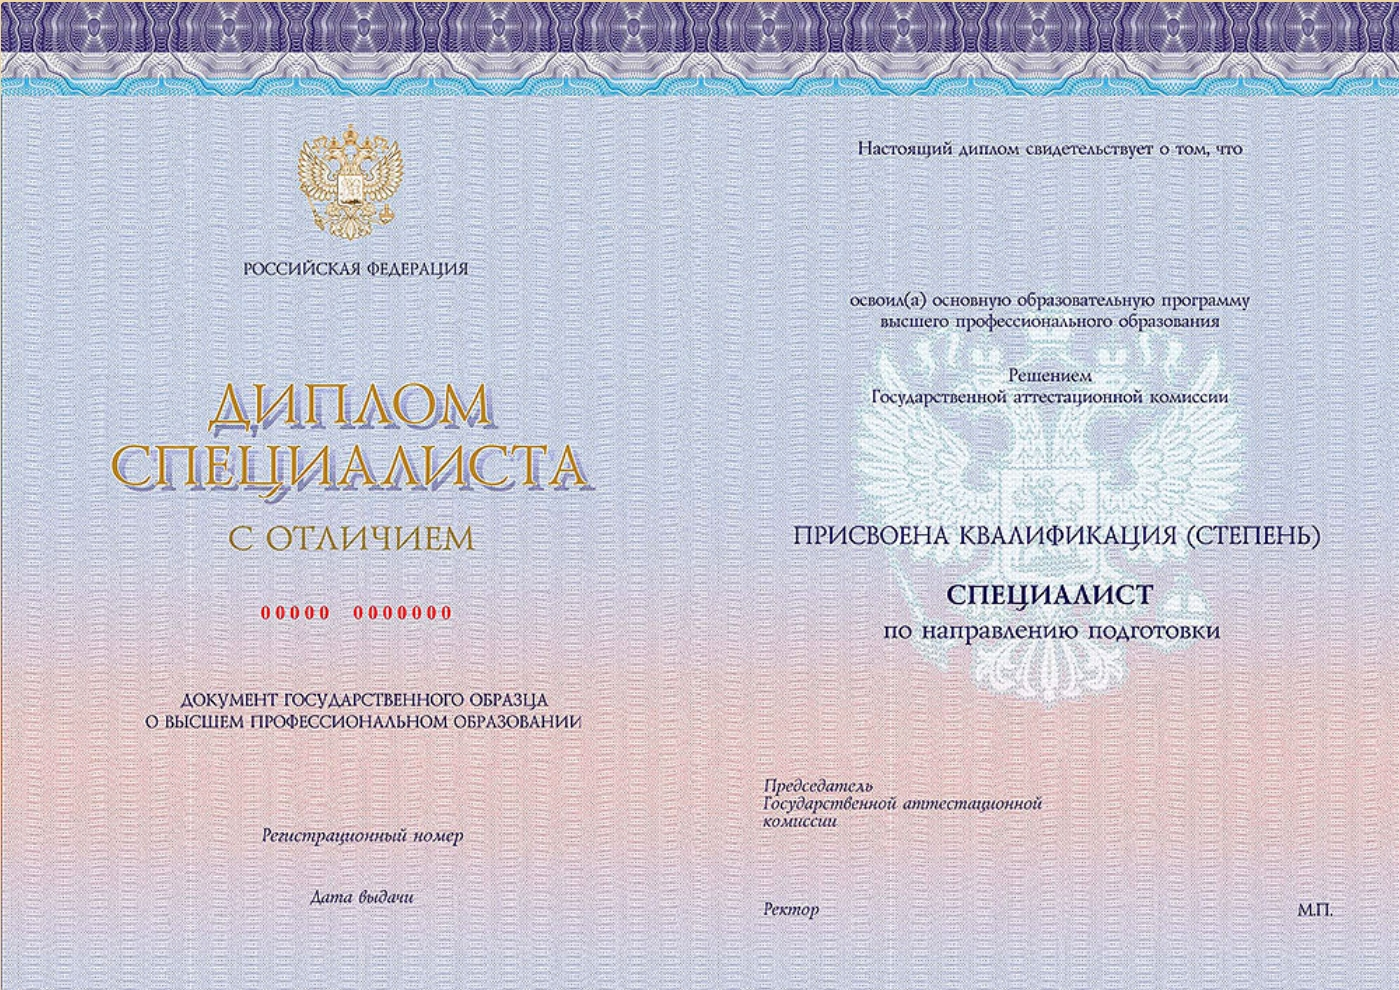 http://diploms-russia.com/diplom-spetsialista.html